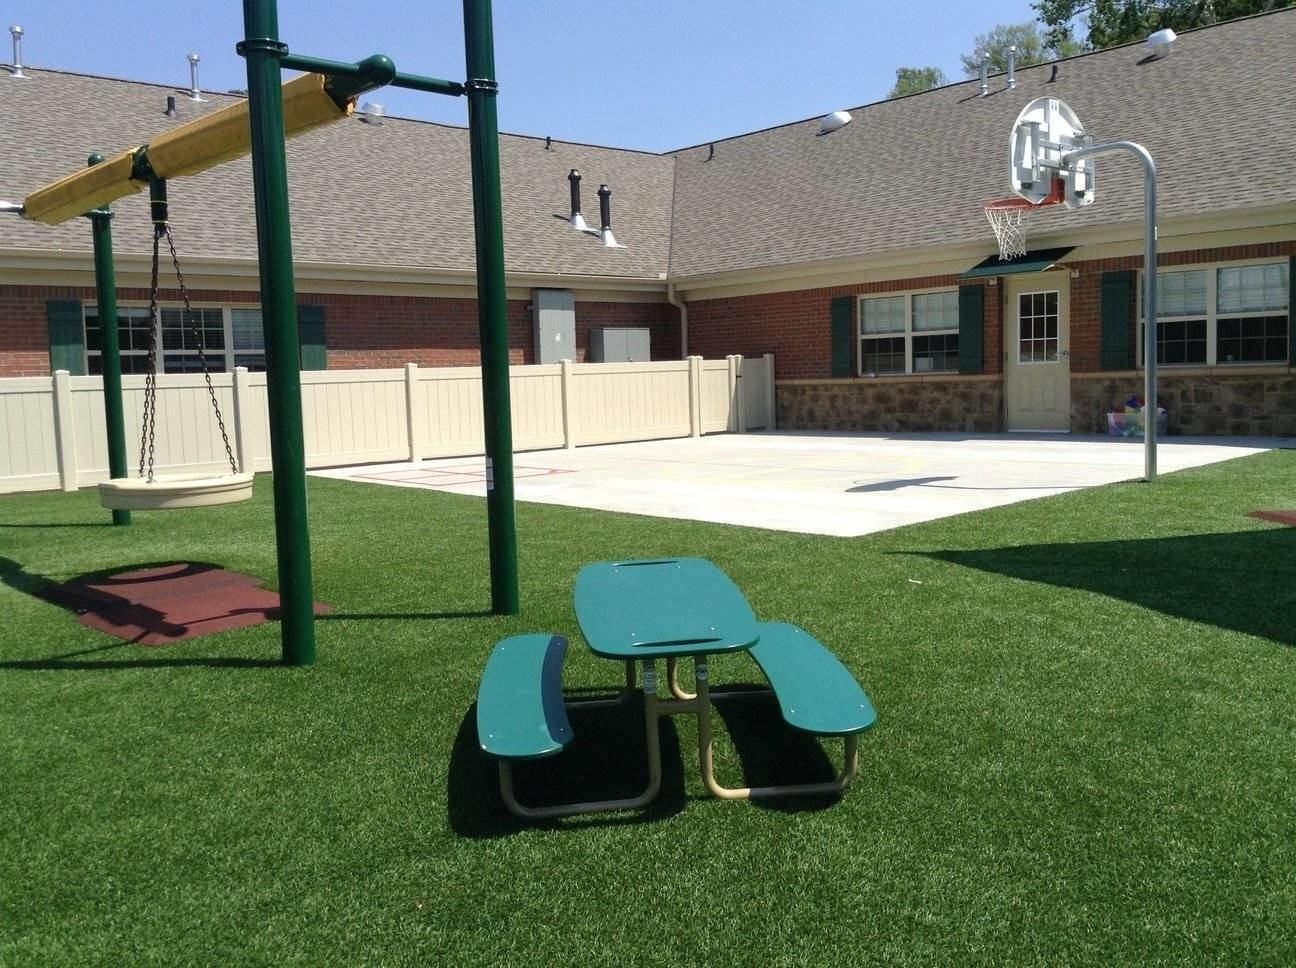 Primrose School of Greenville image 6